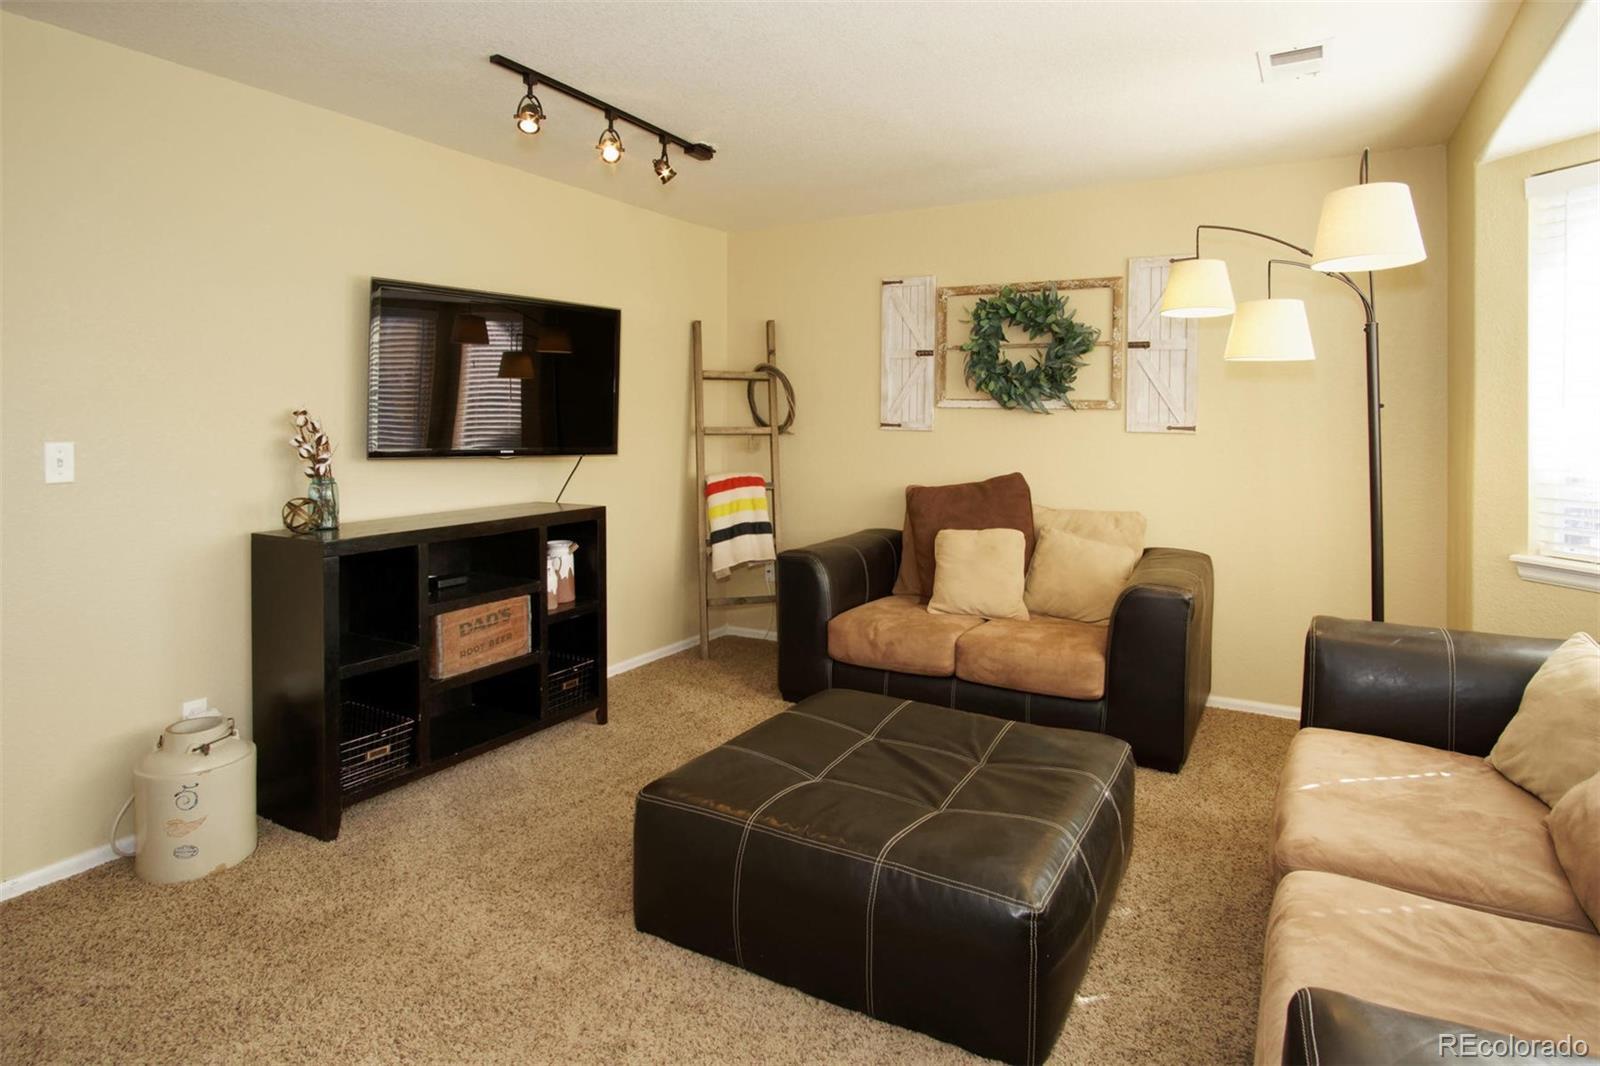 MLS# 1588259 - 27 - 11326 W Crestline Drive, Littleton, CO 80127